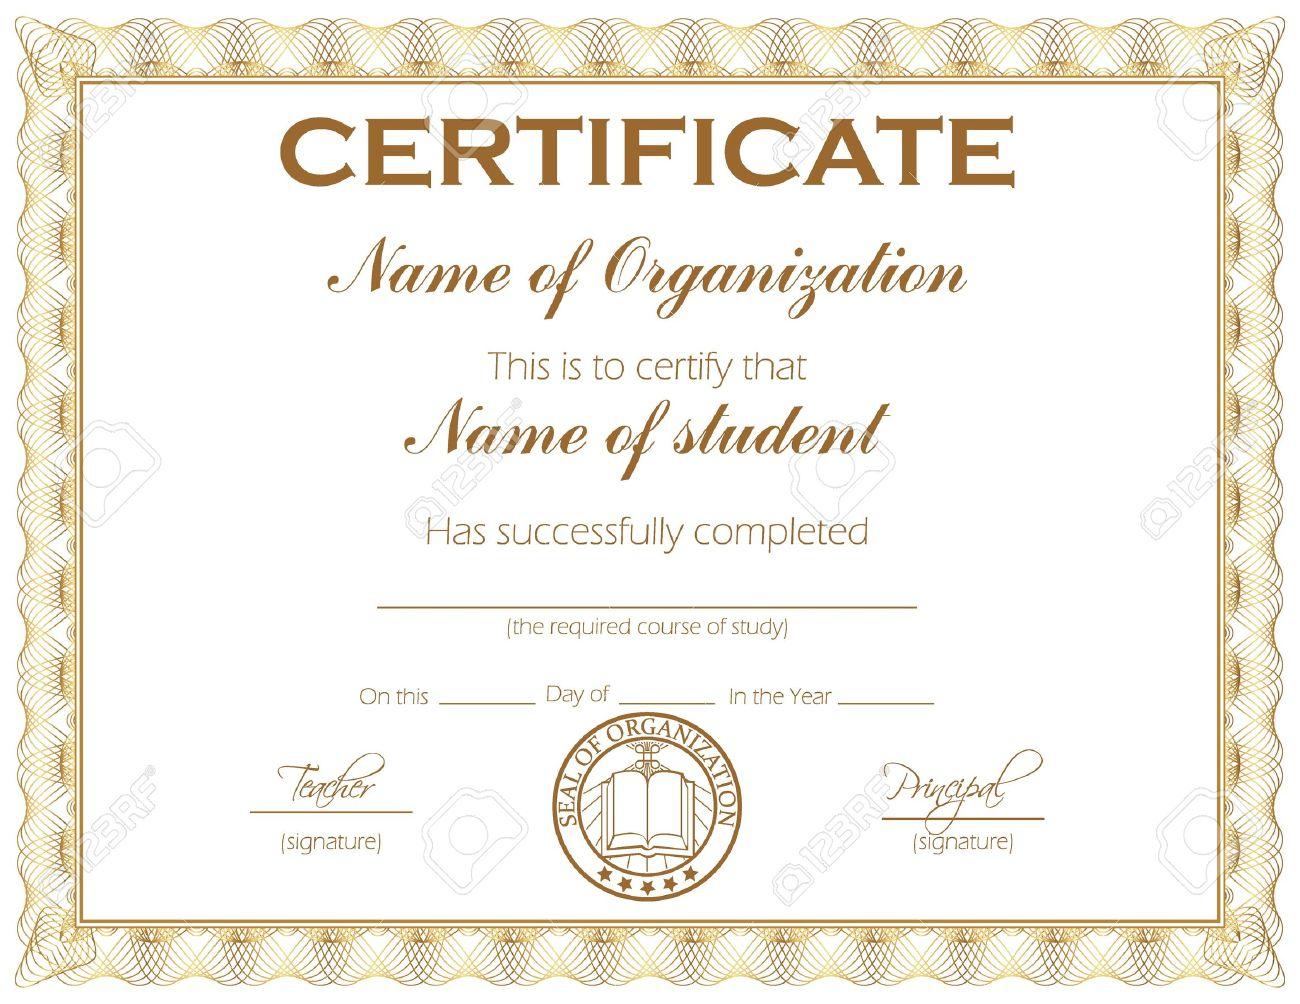 Generic award certificate pasoevolist generic award certificate yelopaper Gallery